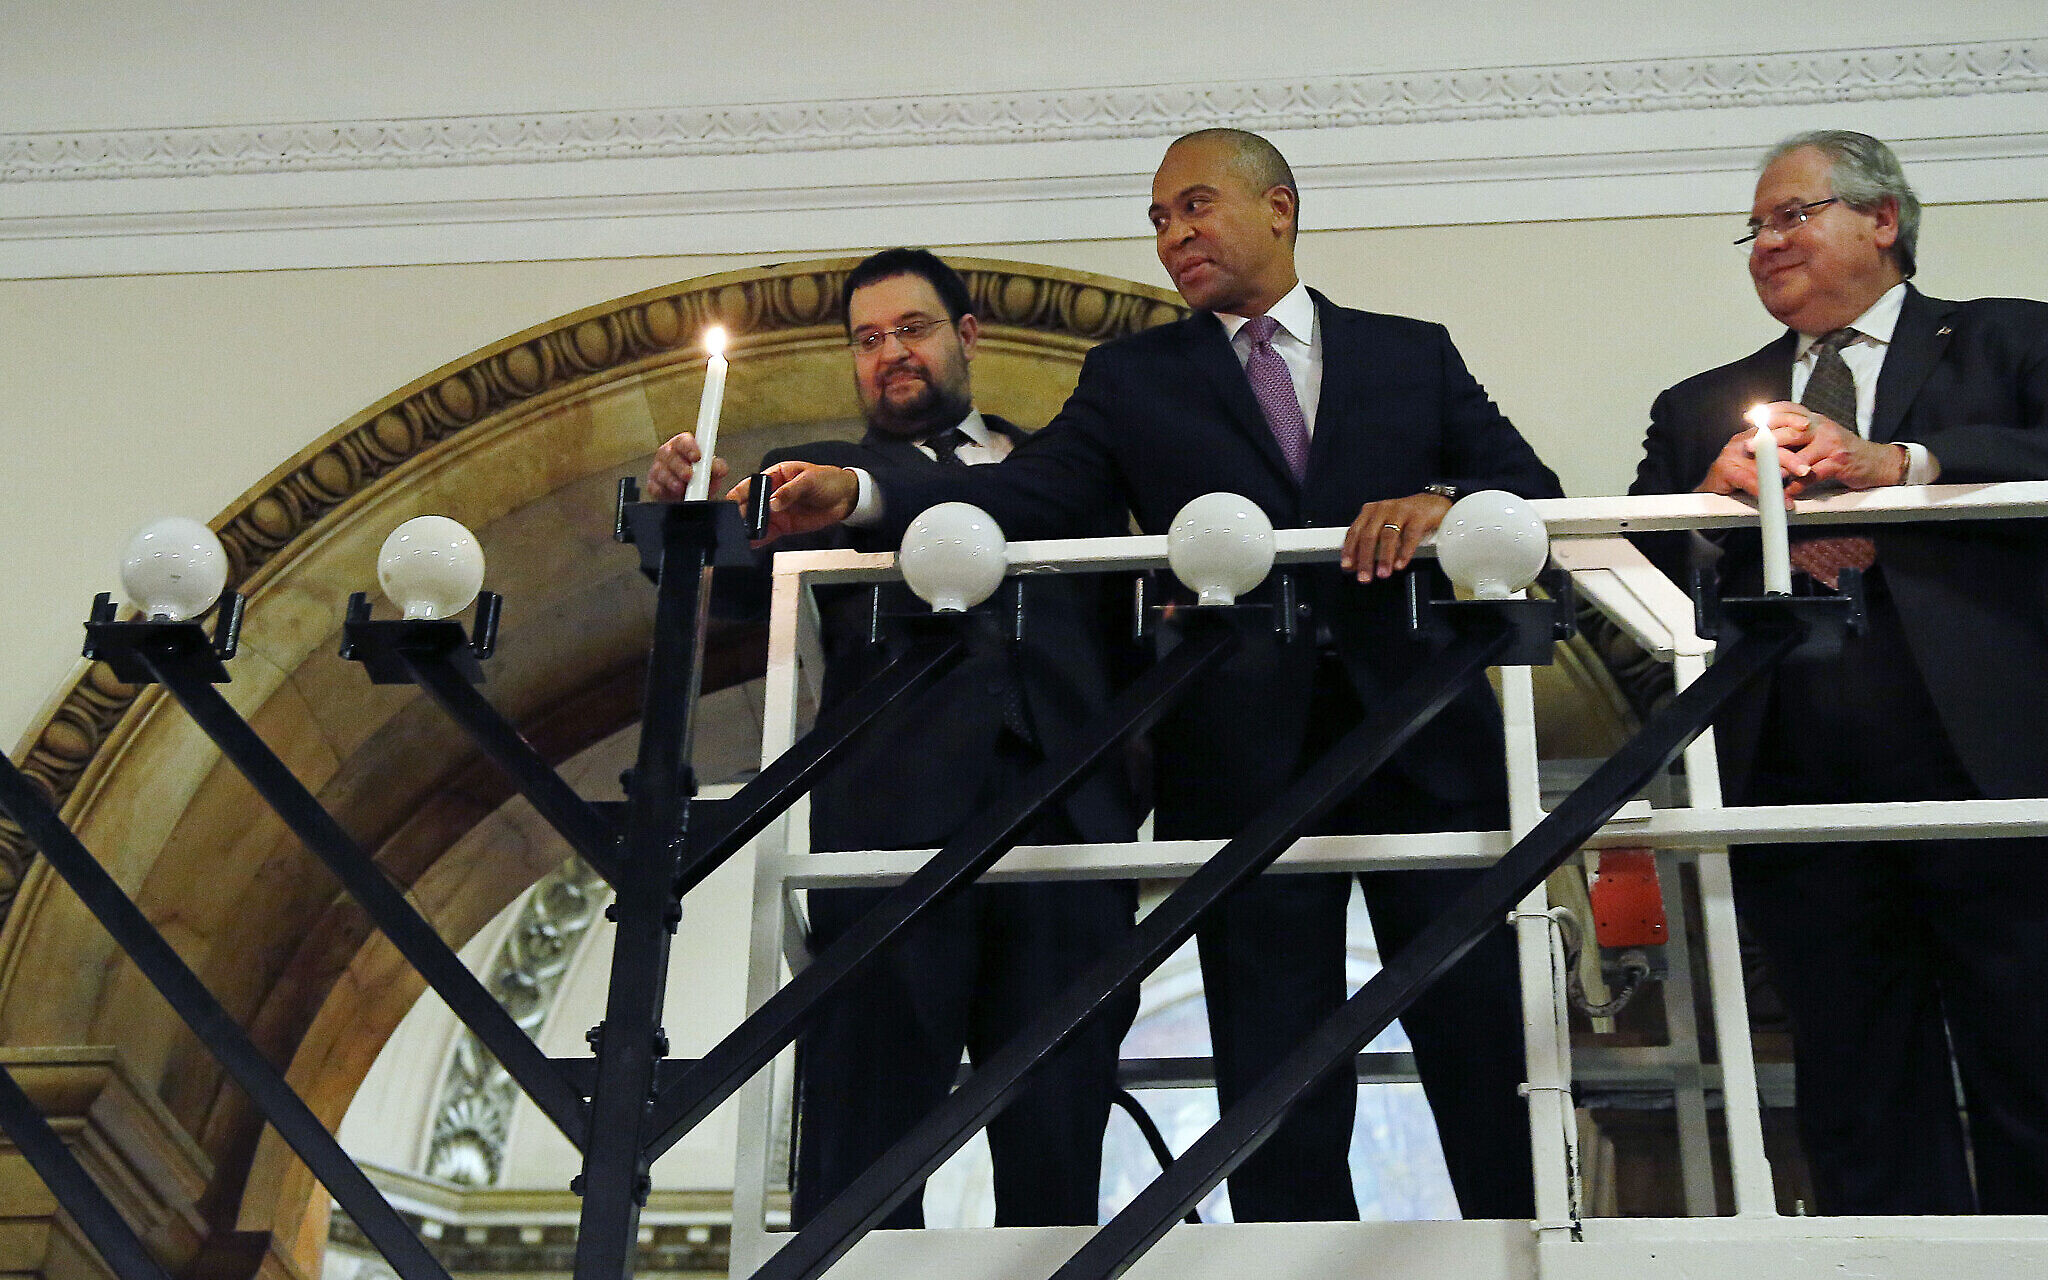 Deval Patrick tells allies he plans 2020 presidential bid